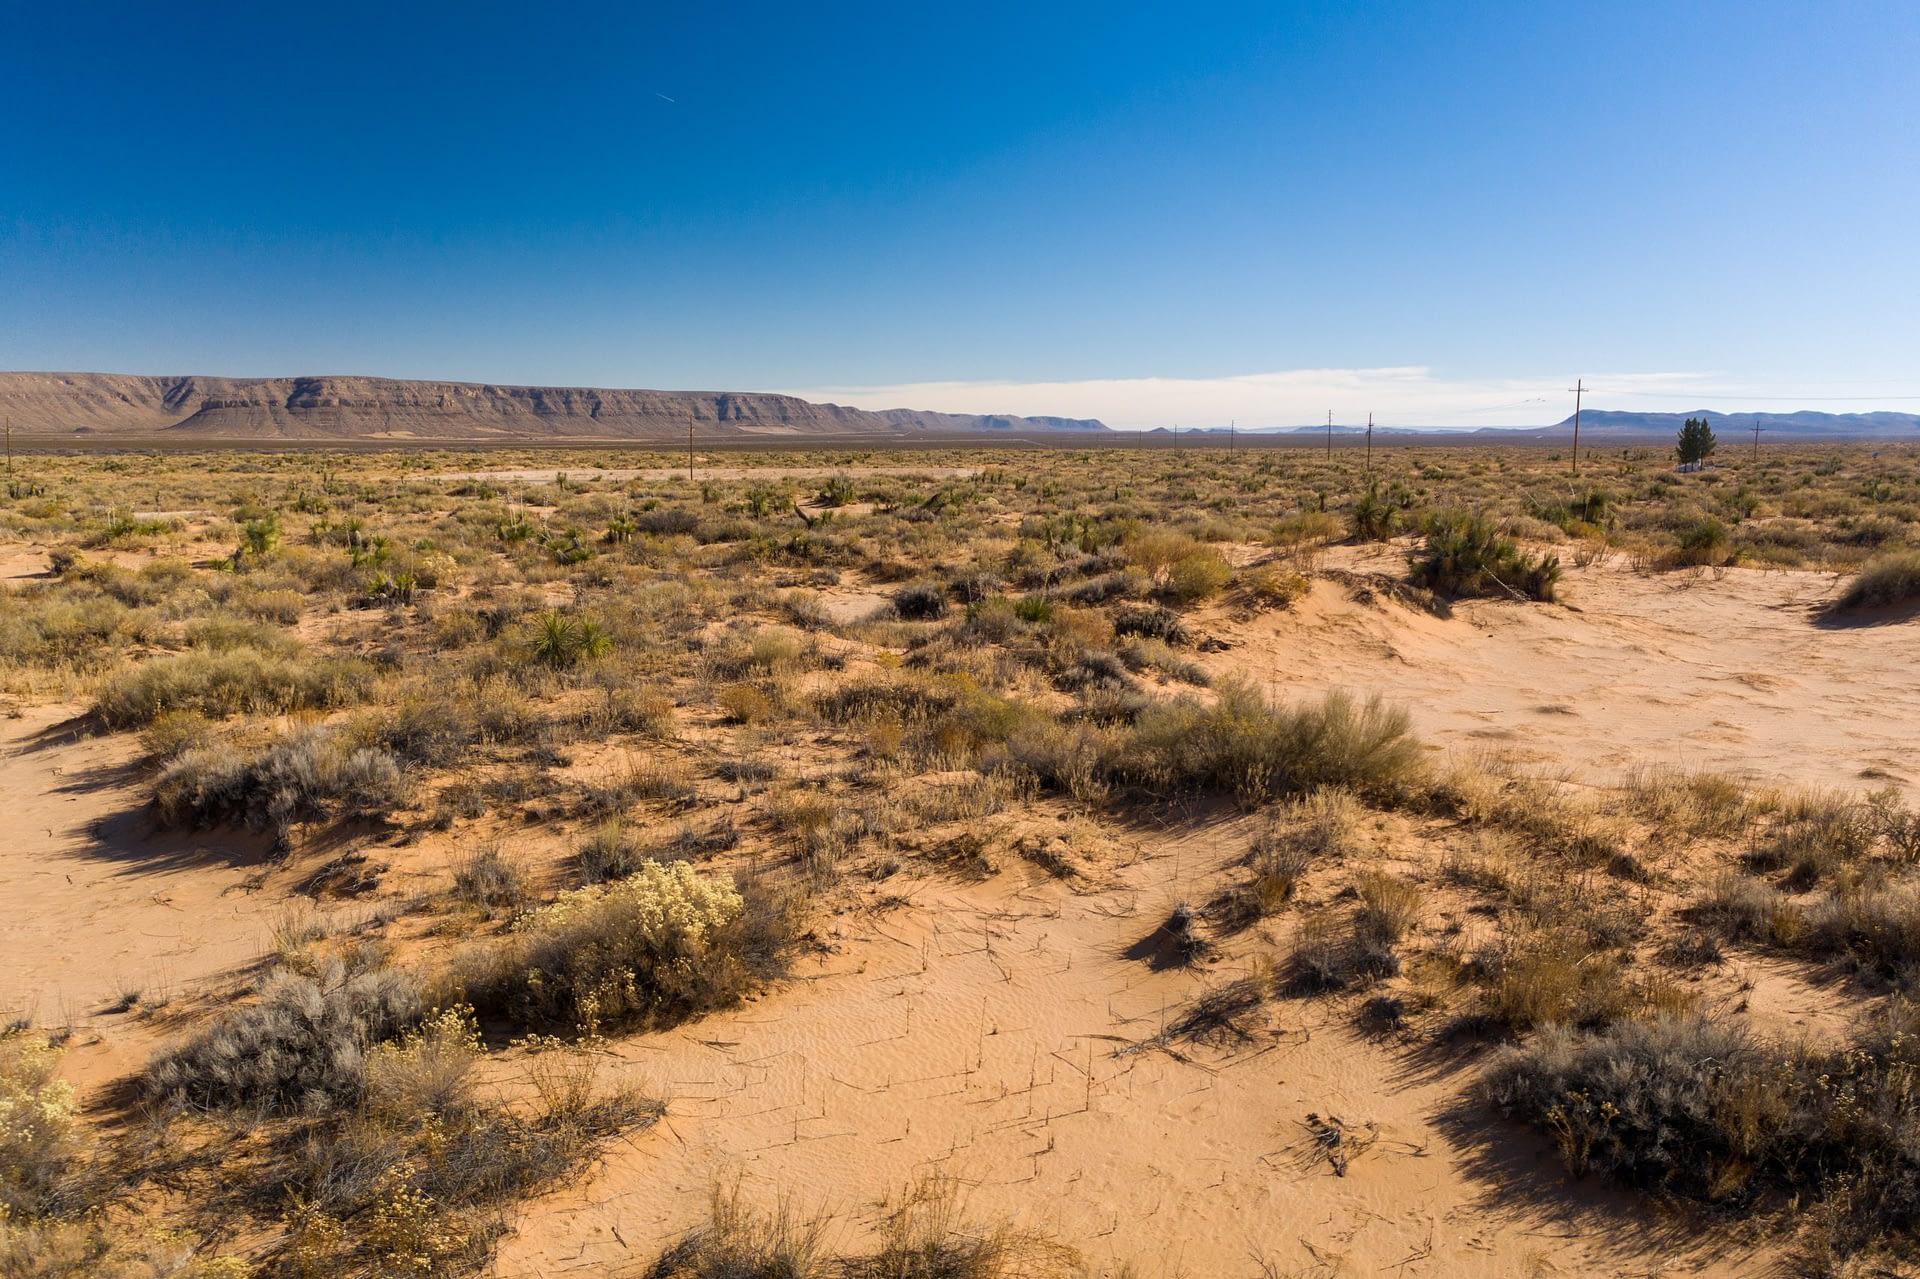 Agua Dulce, El Paso, TX 79928